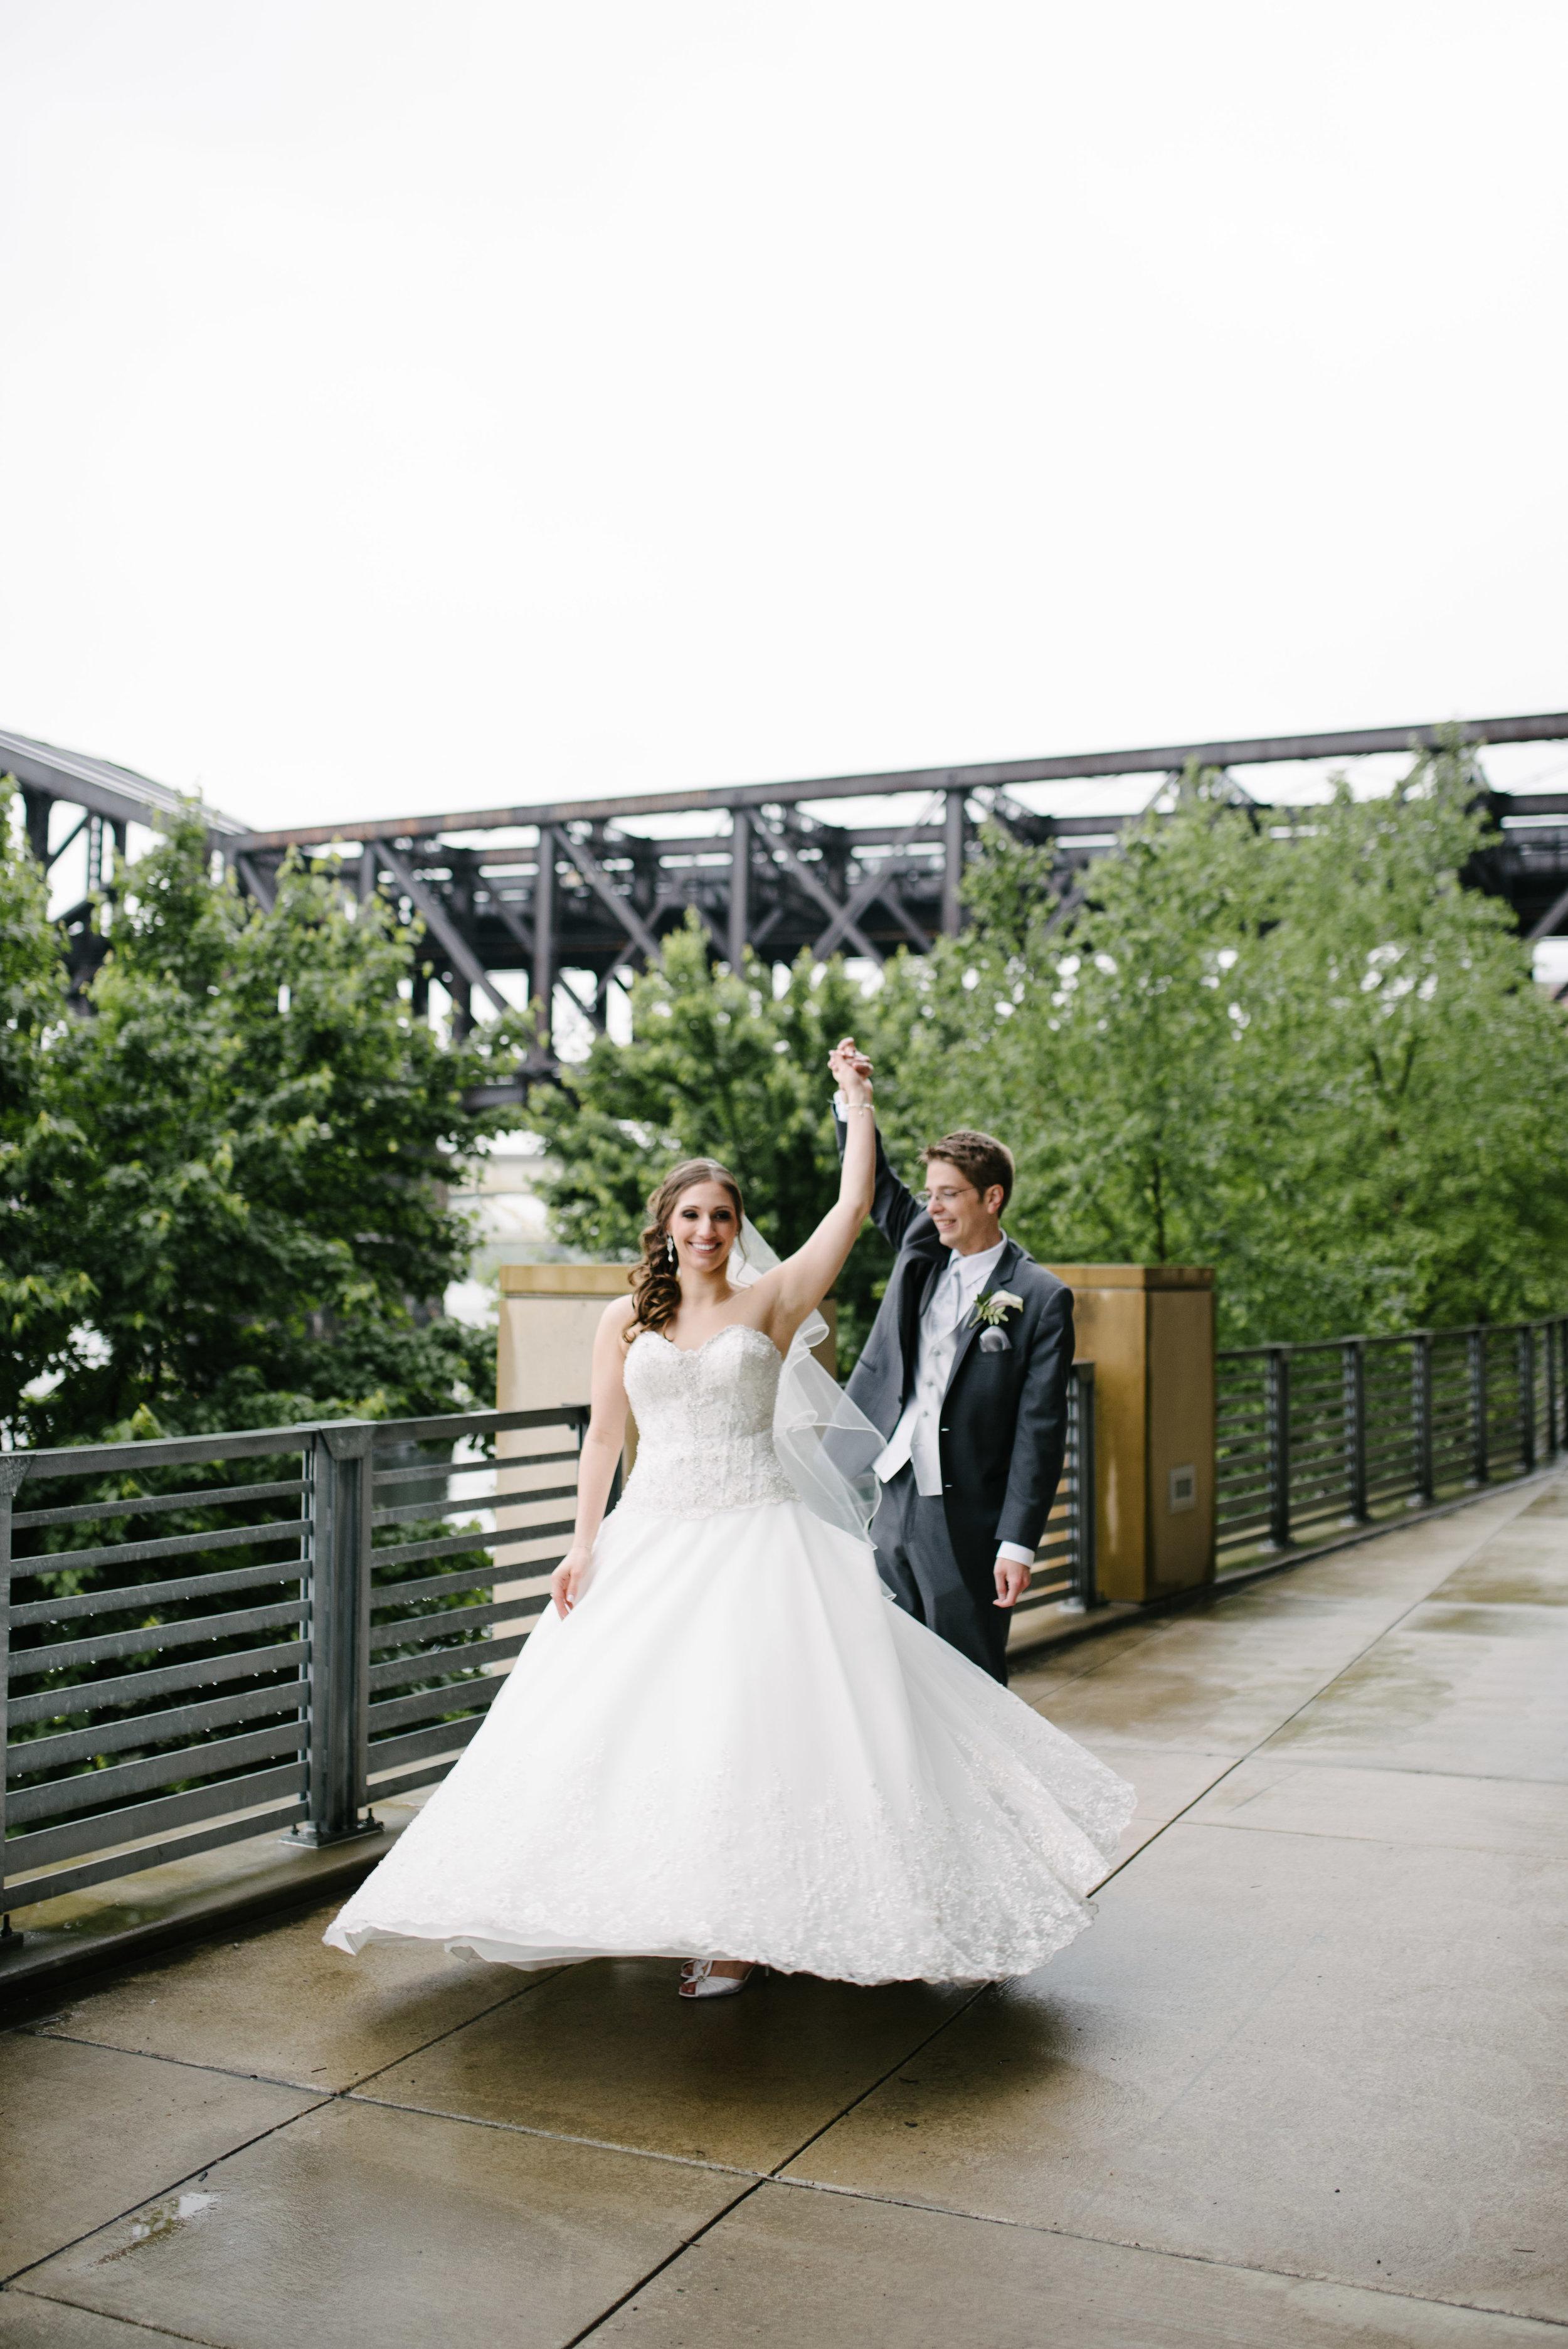 Wedding portraits Pittsburgh // The Miner Details weddings